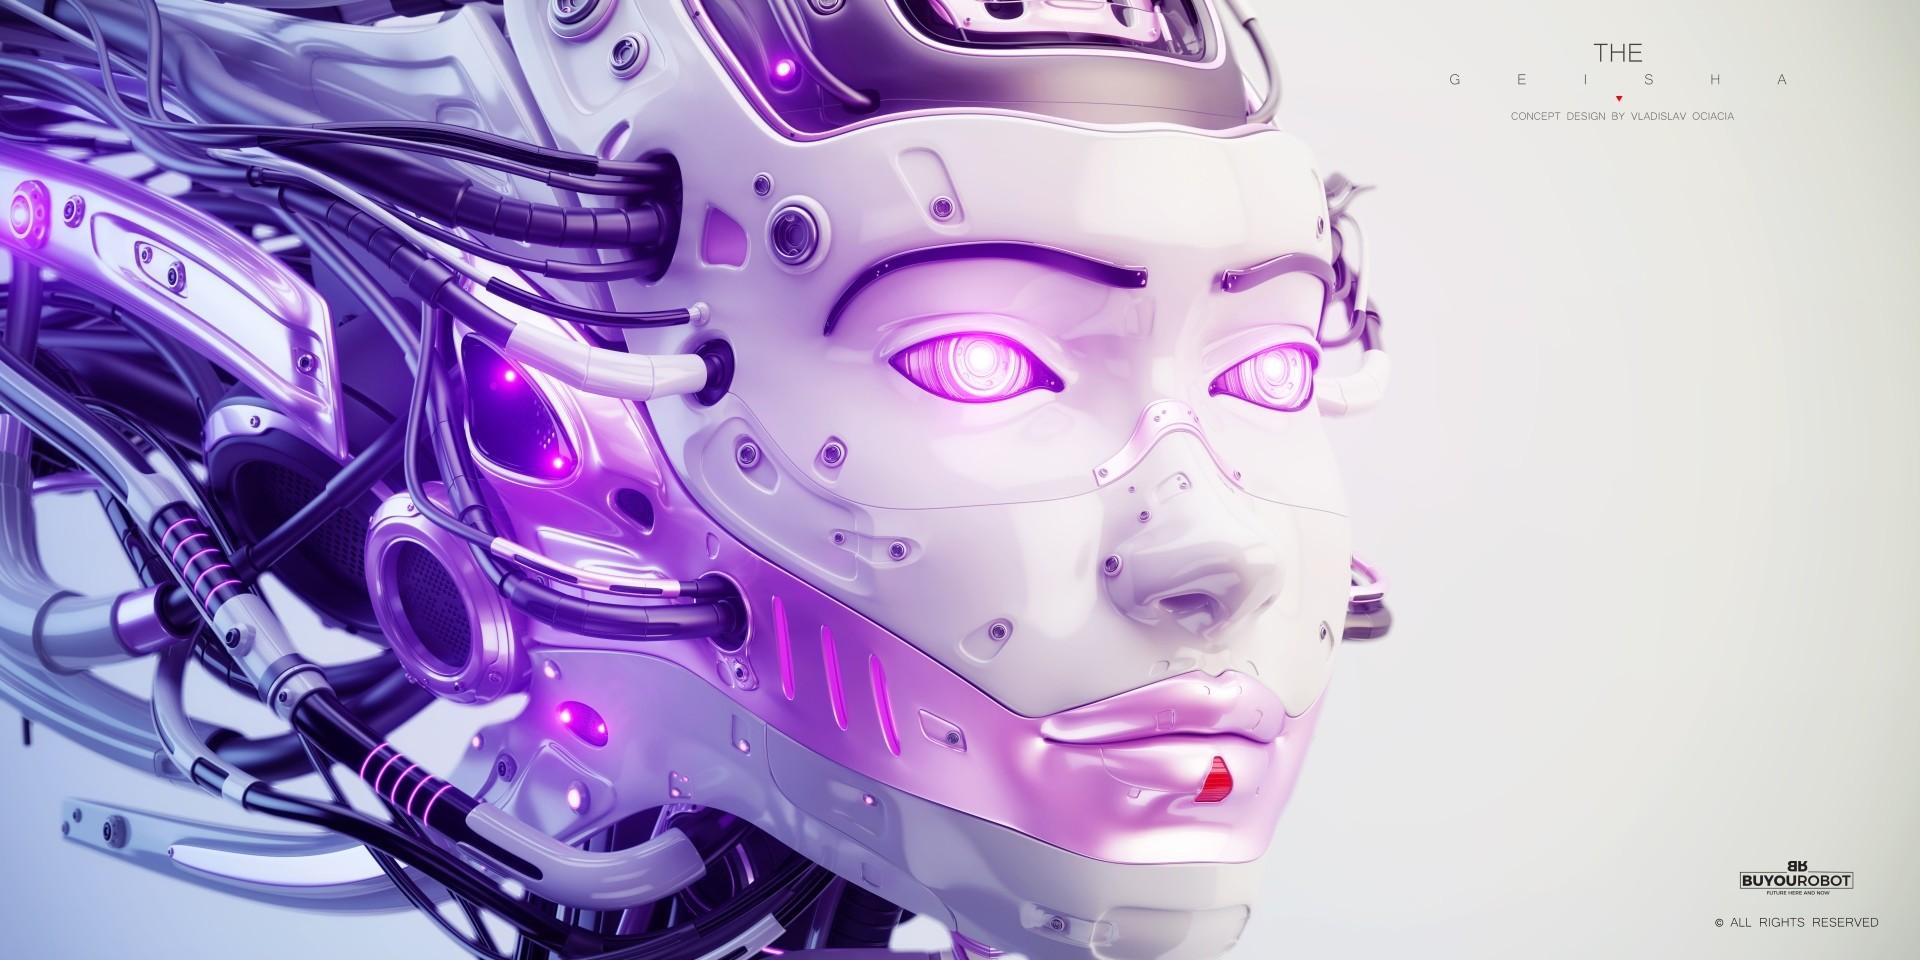 Vladislav ociacia geisha robot 4